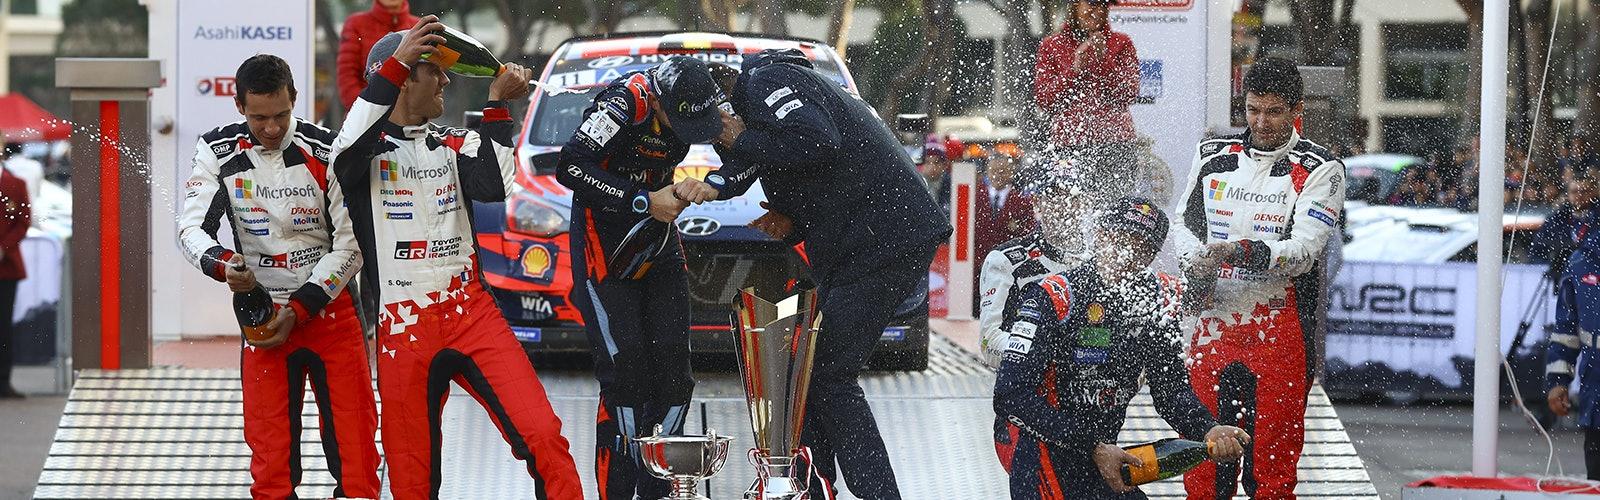 Monte Carlo Rally podium 2020